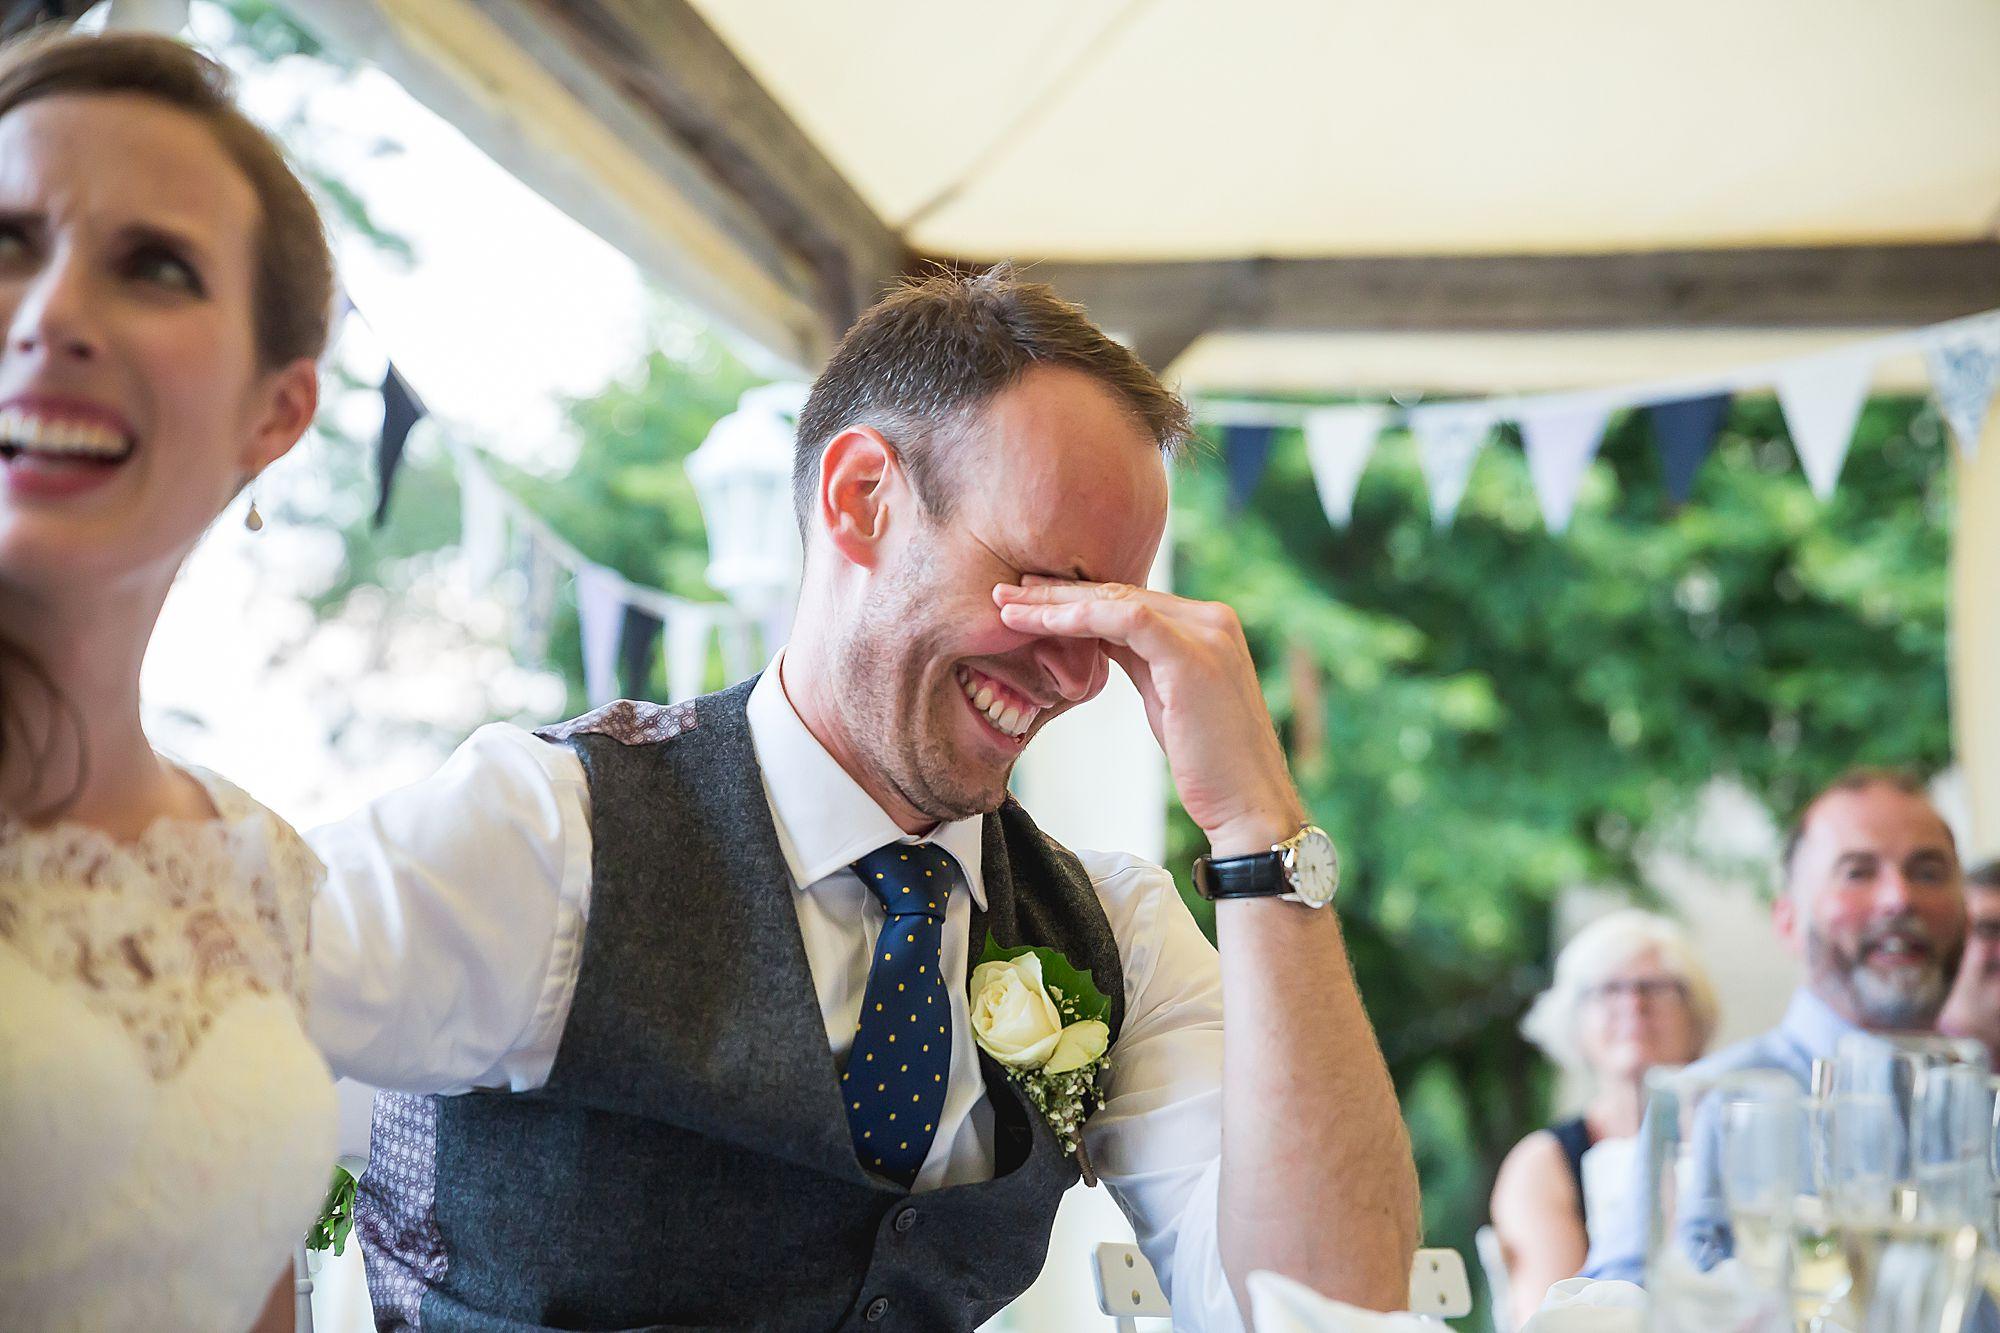 groom looks very embarrassed